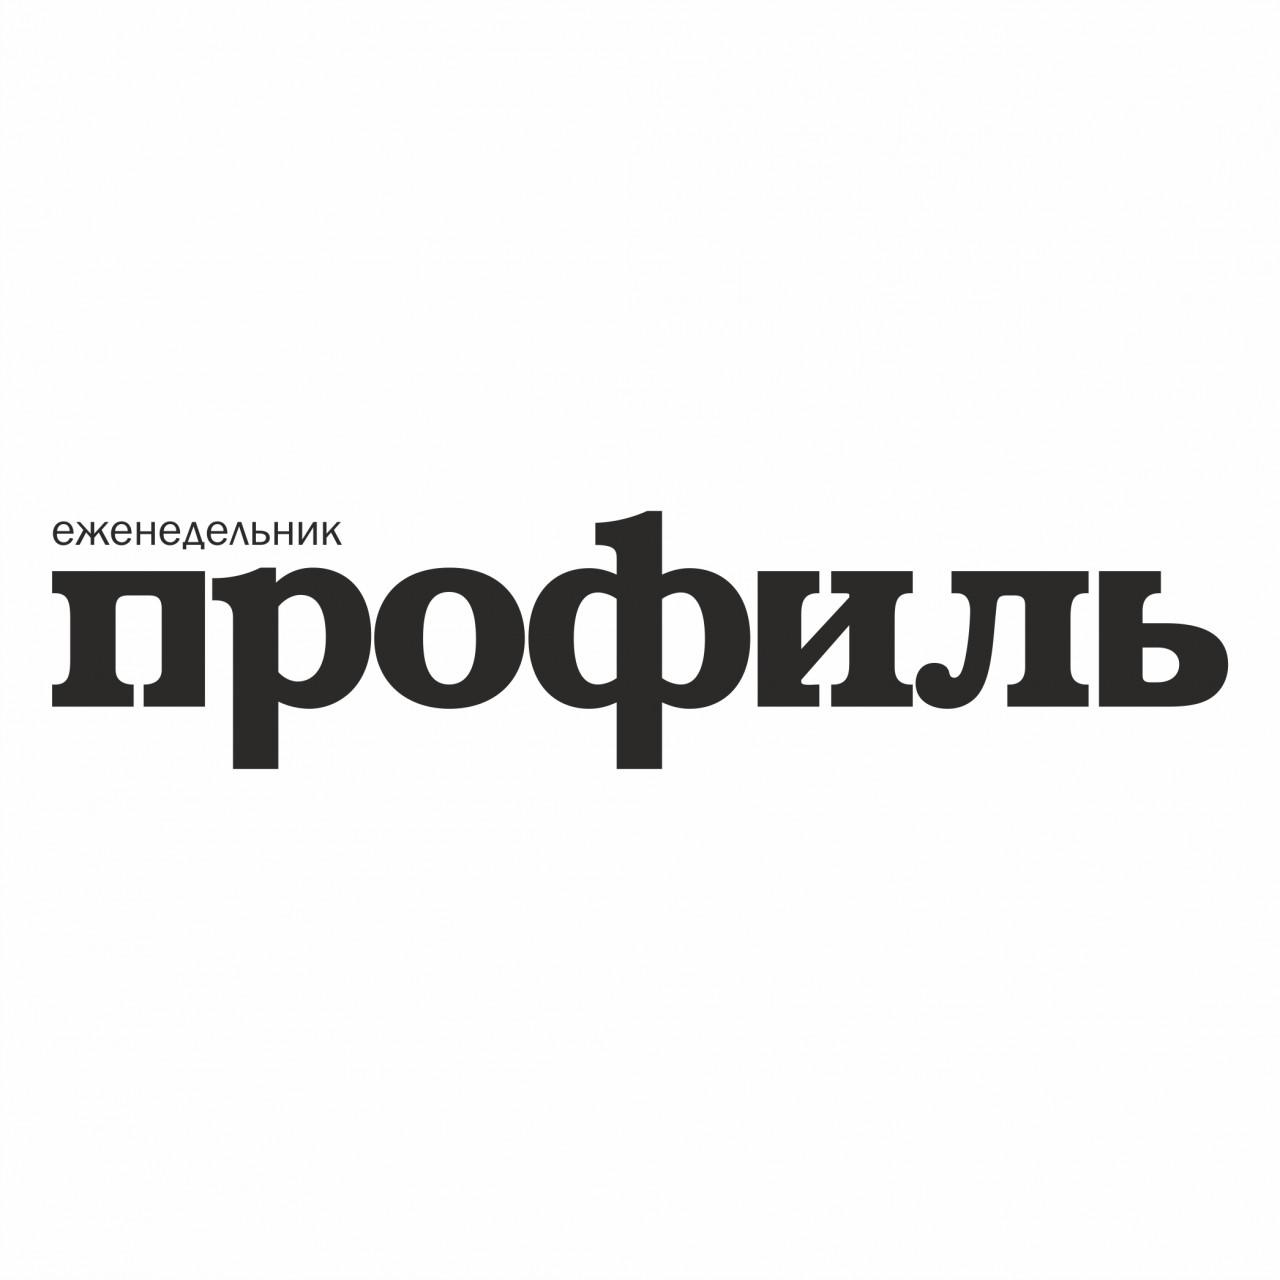 Госдума утвердила Медведева на посту премьер-министра